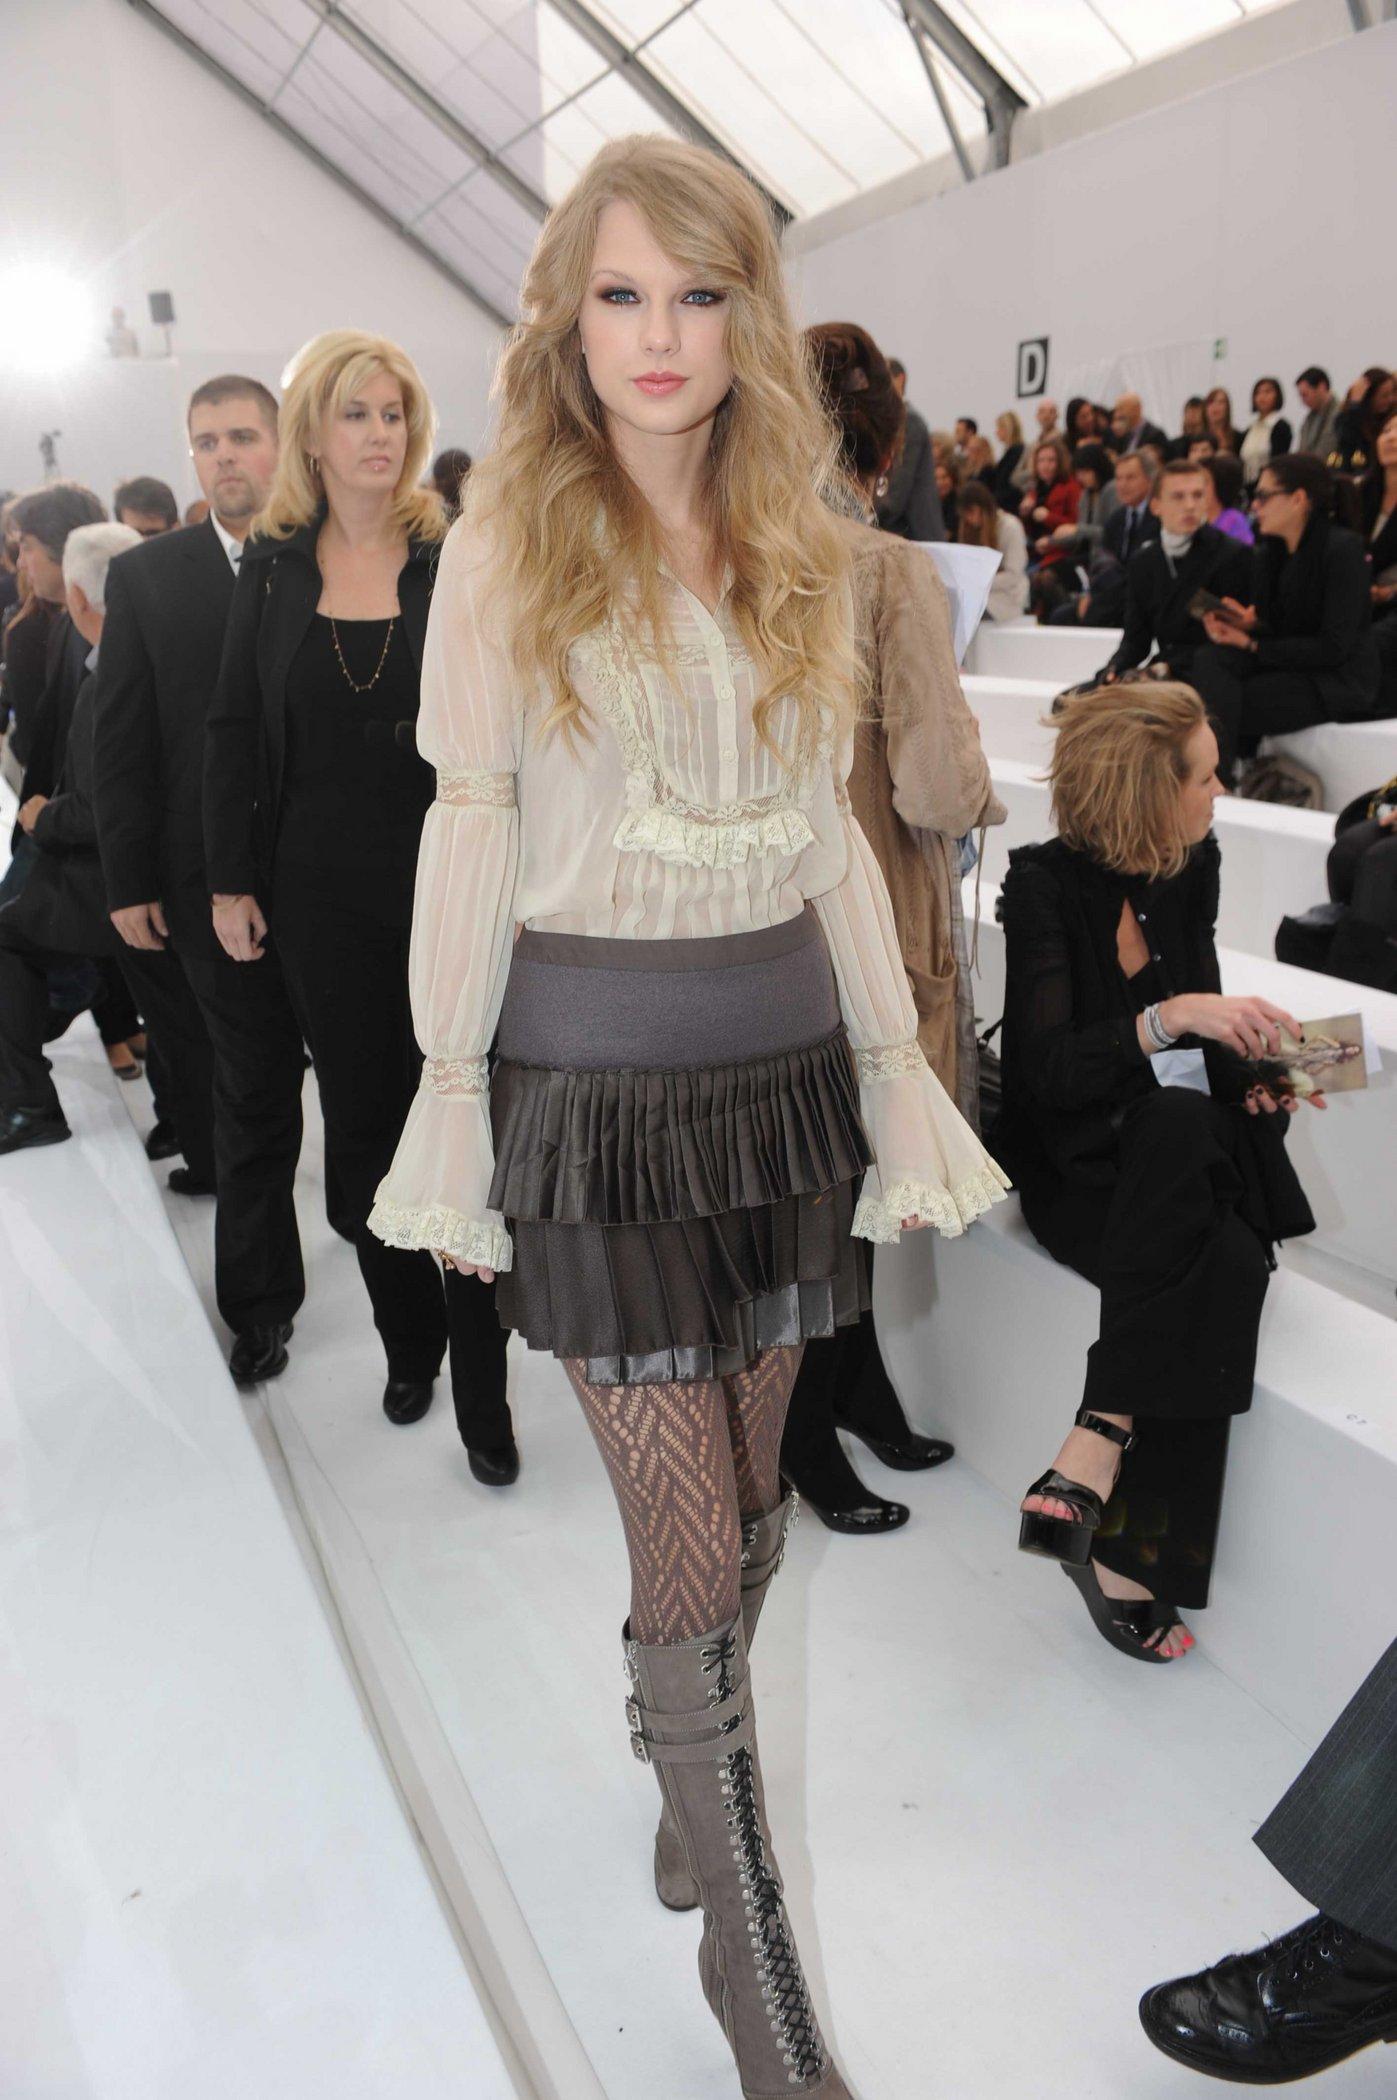 Image - Taylor Swift D'lite Sparkling+Boots 14.jpg | Taylor Swift ...